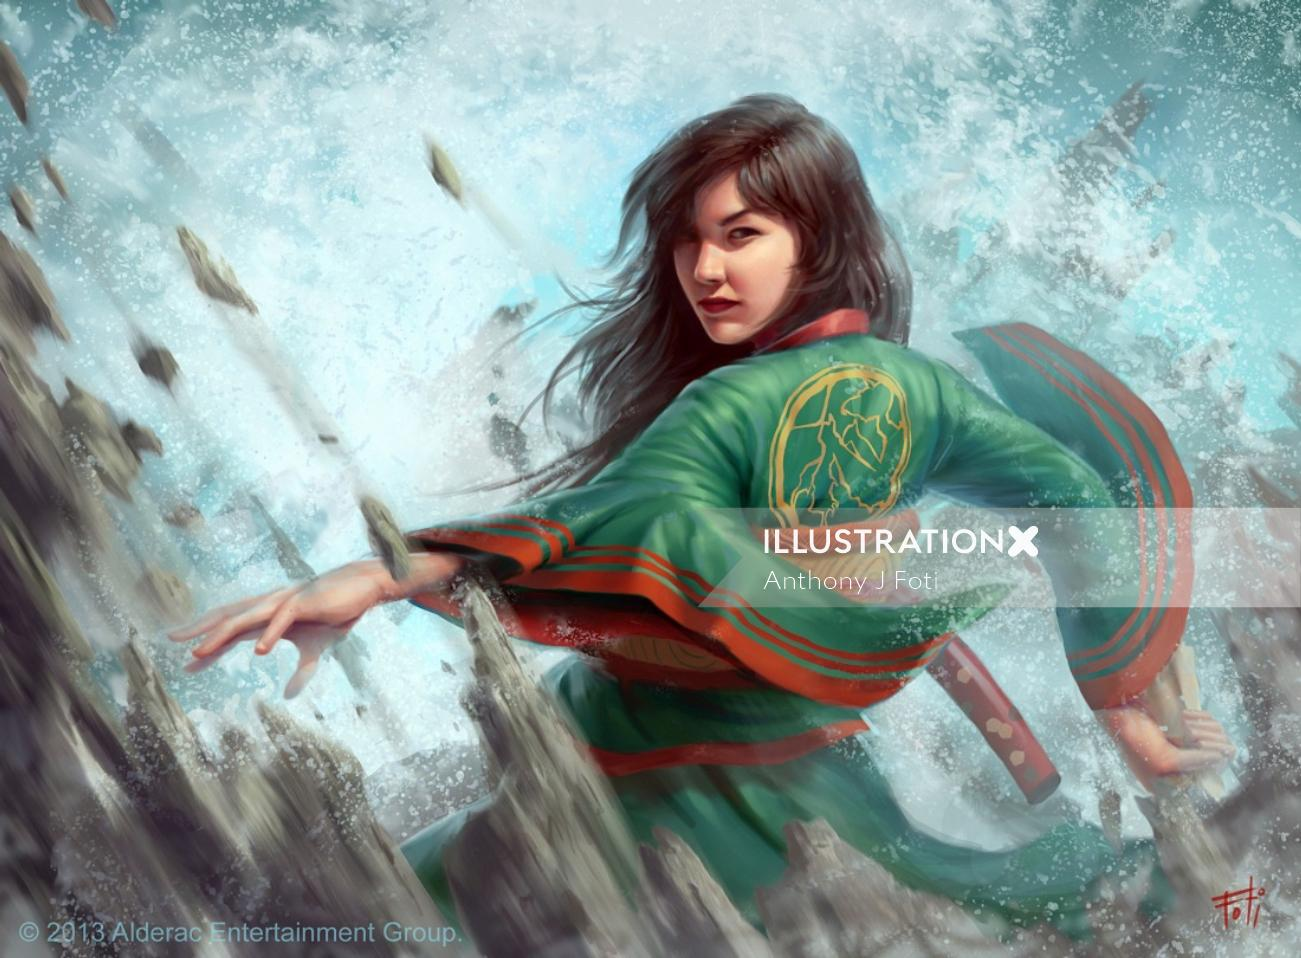 Illustration of Yoritomo Harumi: Legend of the Five Rings